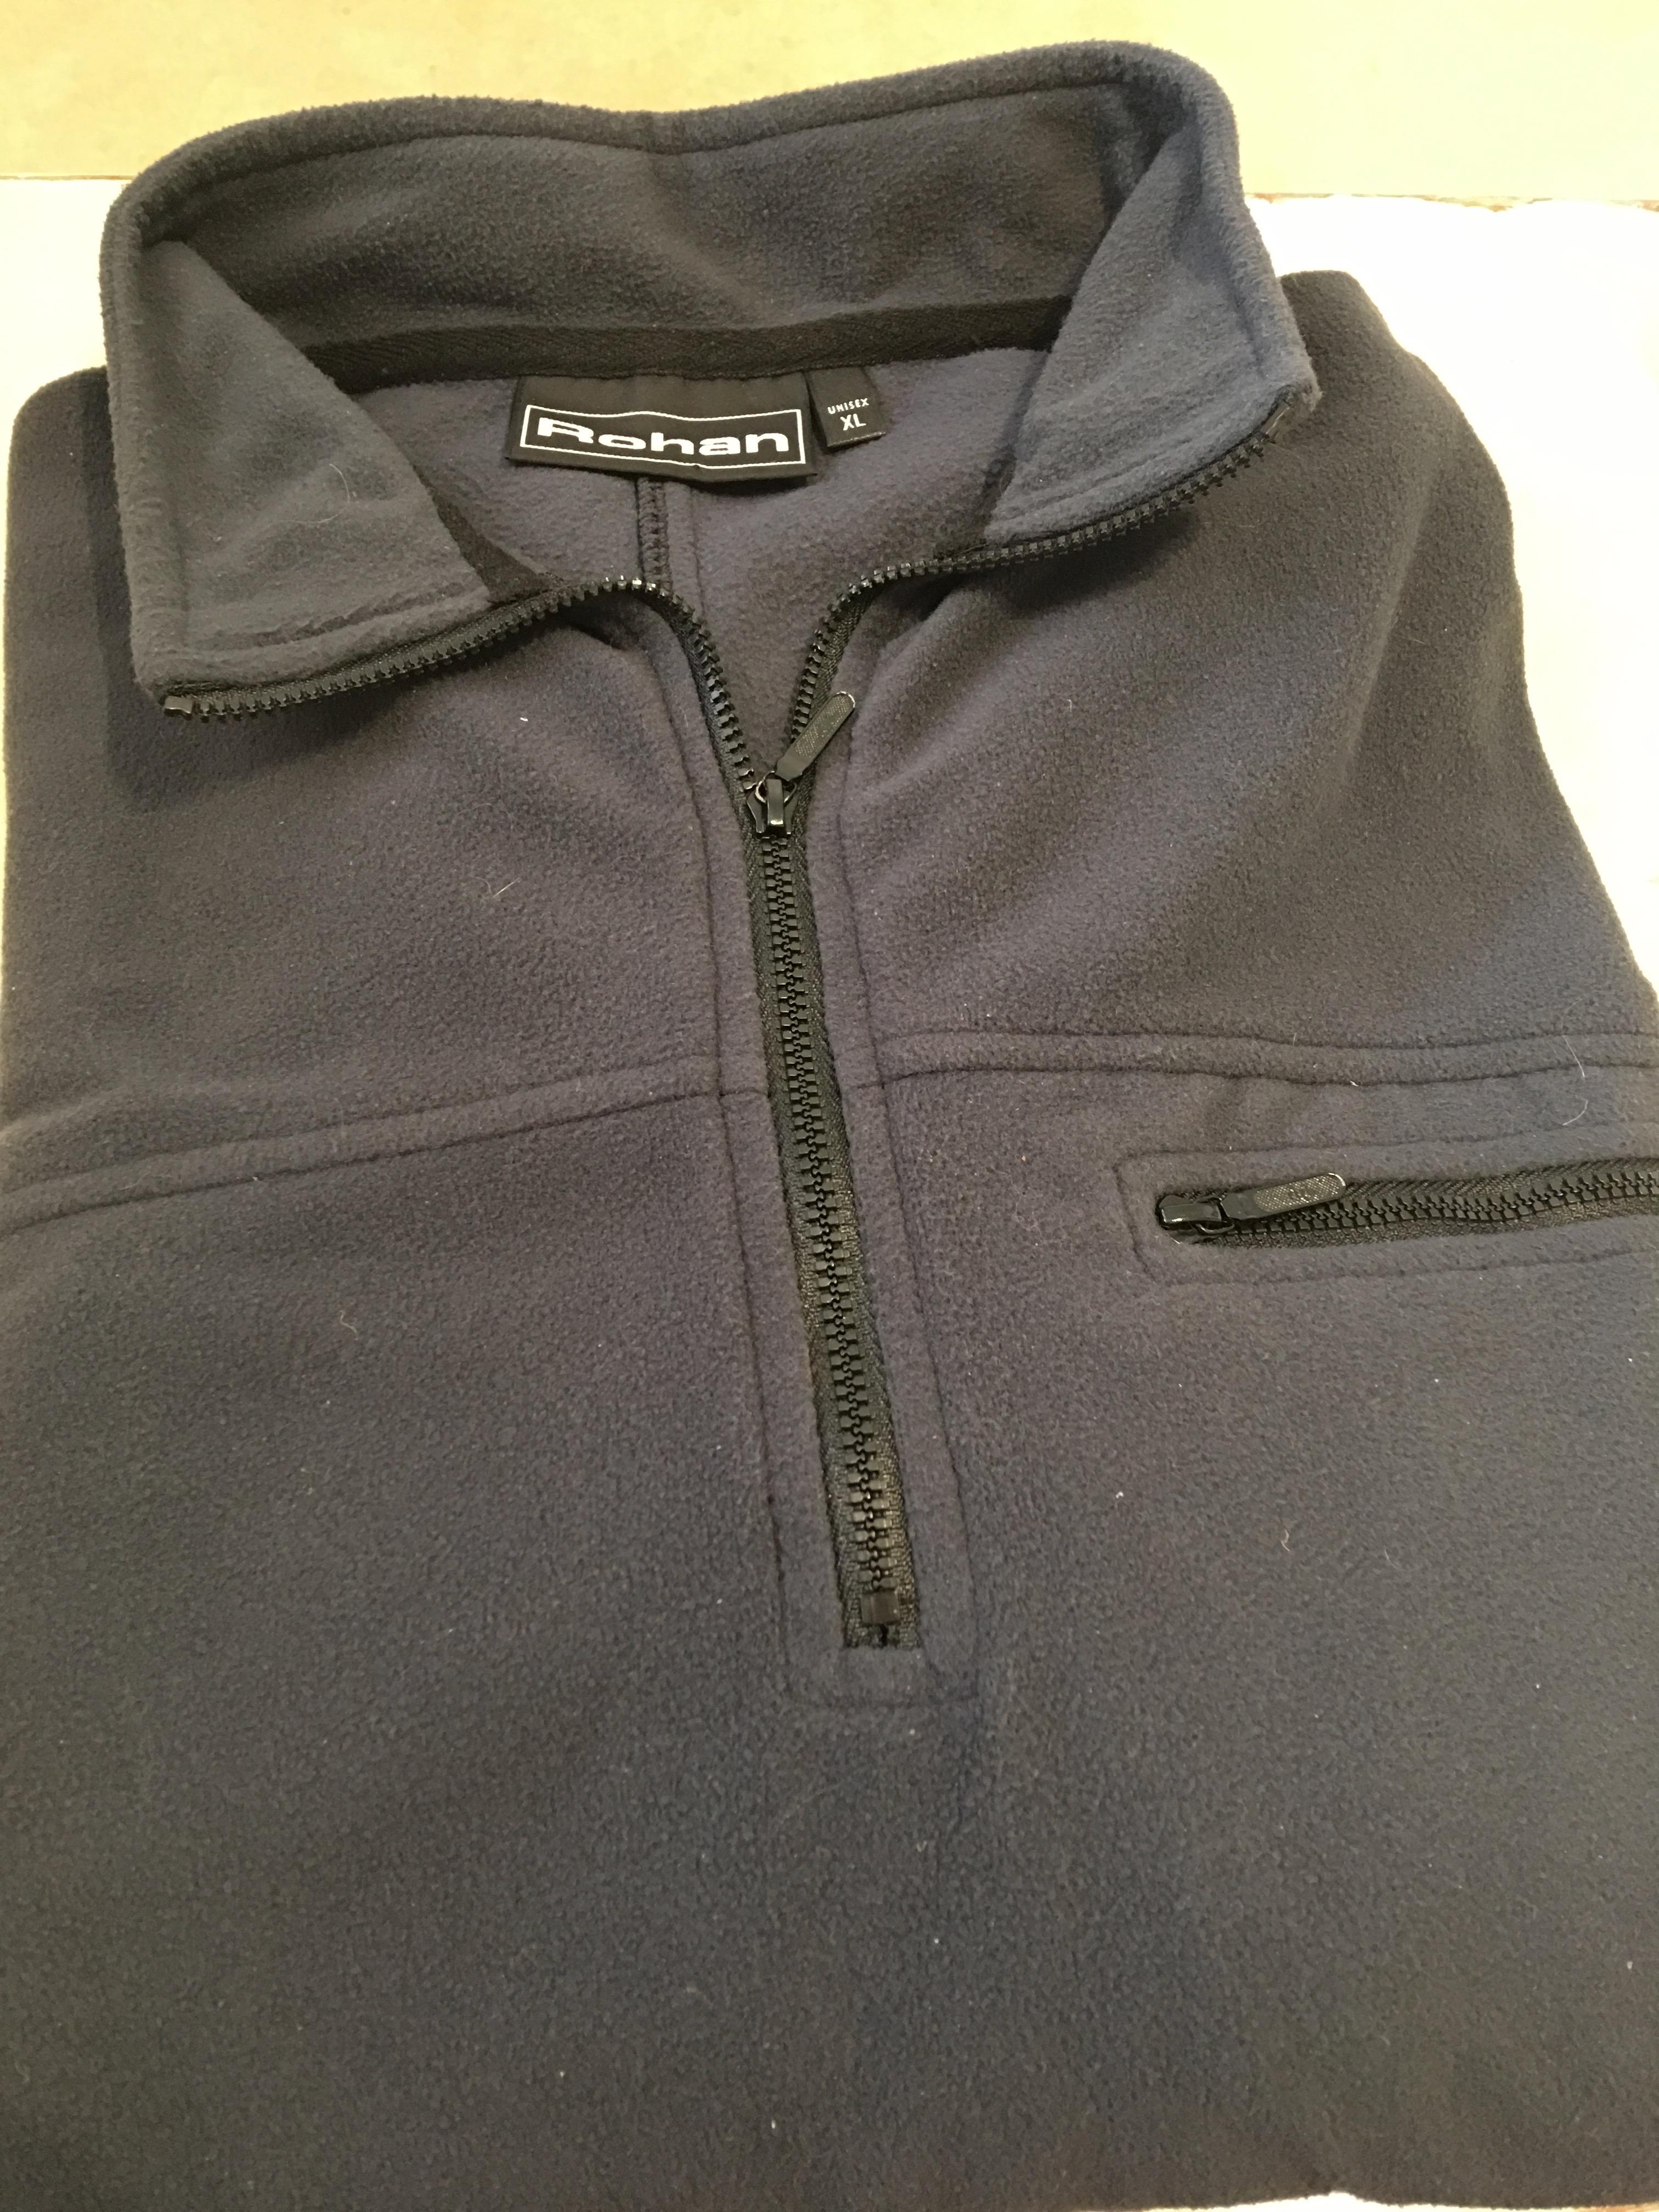 Welsh Corgi Gift For Dog Lover Design Sweatshirt Men Hoody Jacket Tops Volume Large Men's Clothing Dashing New Fashion Autumn Winter Funny Hoodie Circle Of Trust